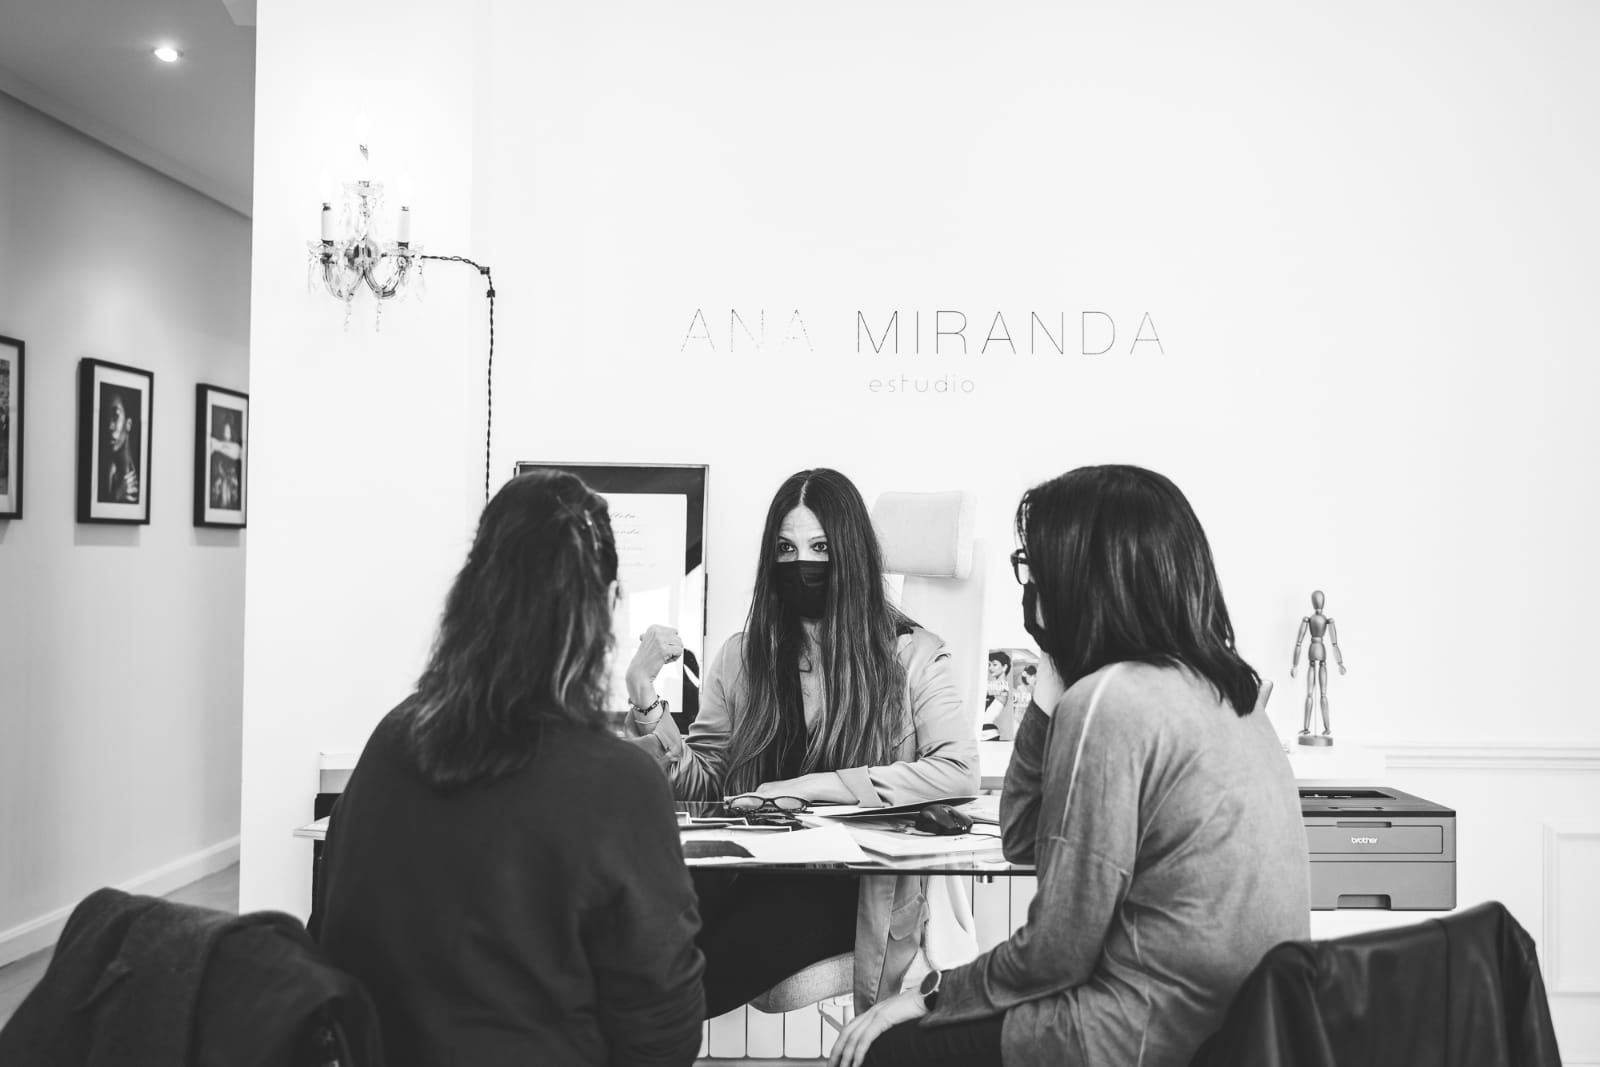 Ana Miranda Estudio